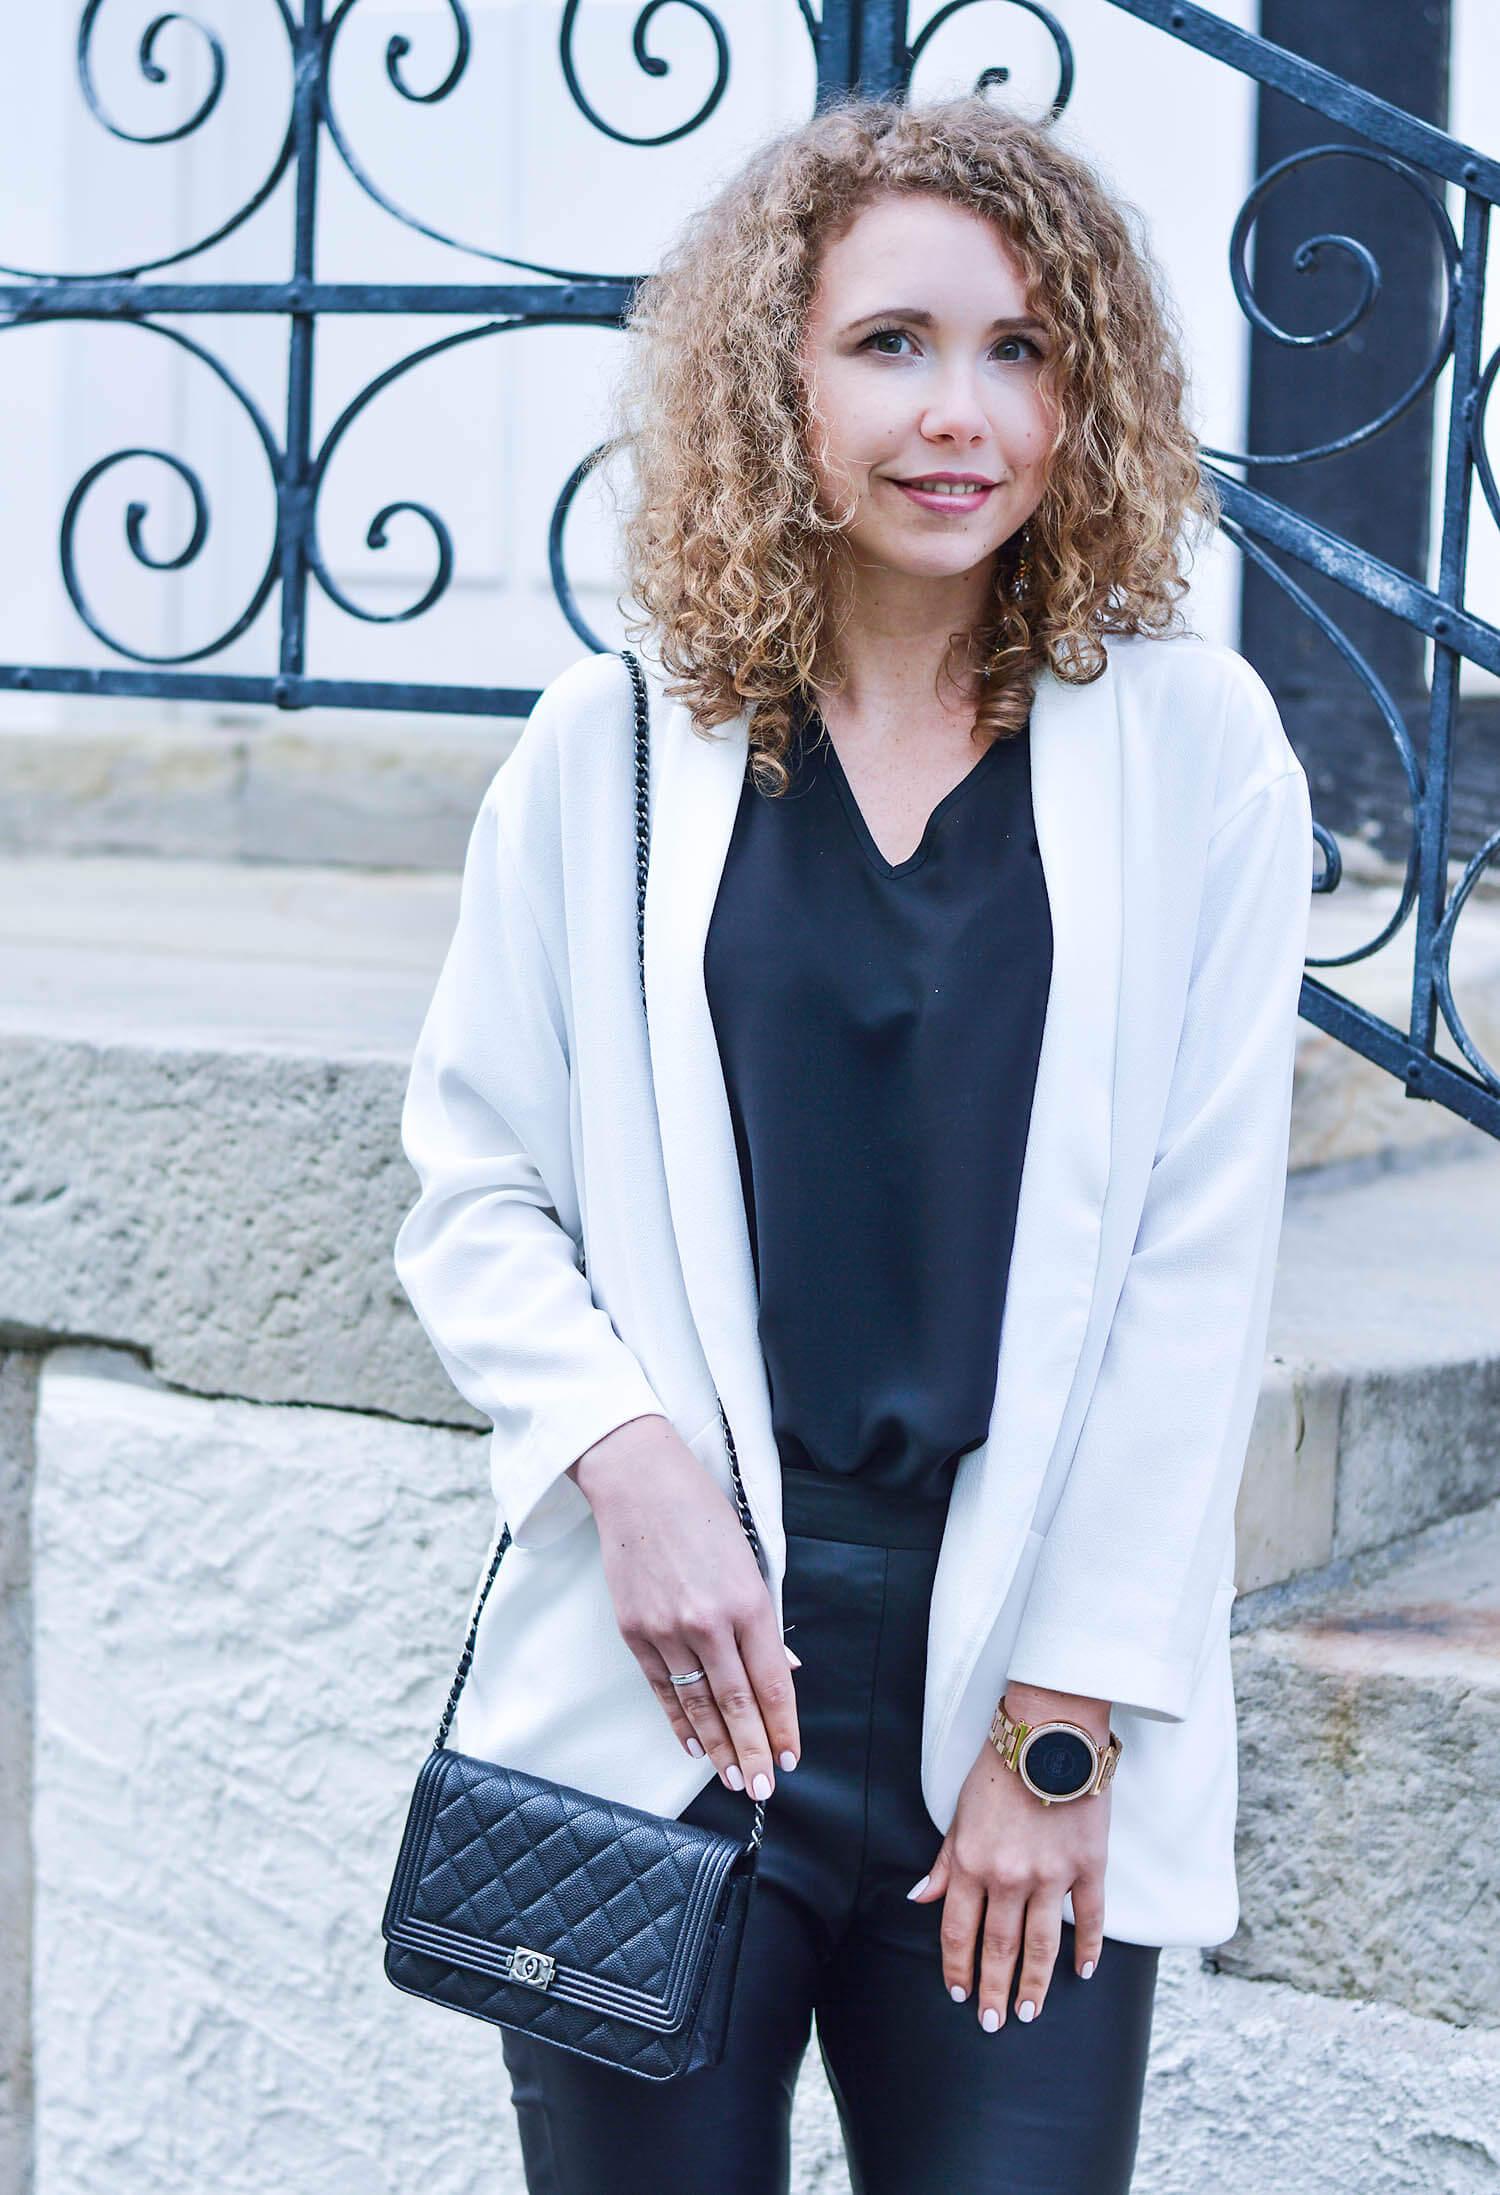 Outfit-Black-Fake-Leather-Pants-White-Blazer-Chanel-Bag-honeymoon-fashionblogger-nrw-kationette-graeflicher-park-bad-driburg